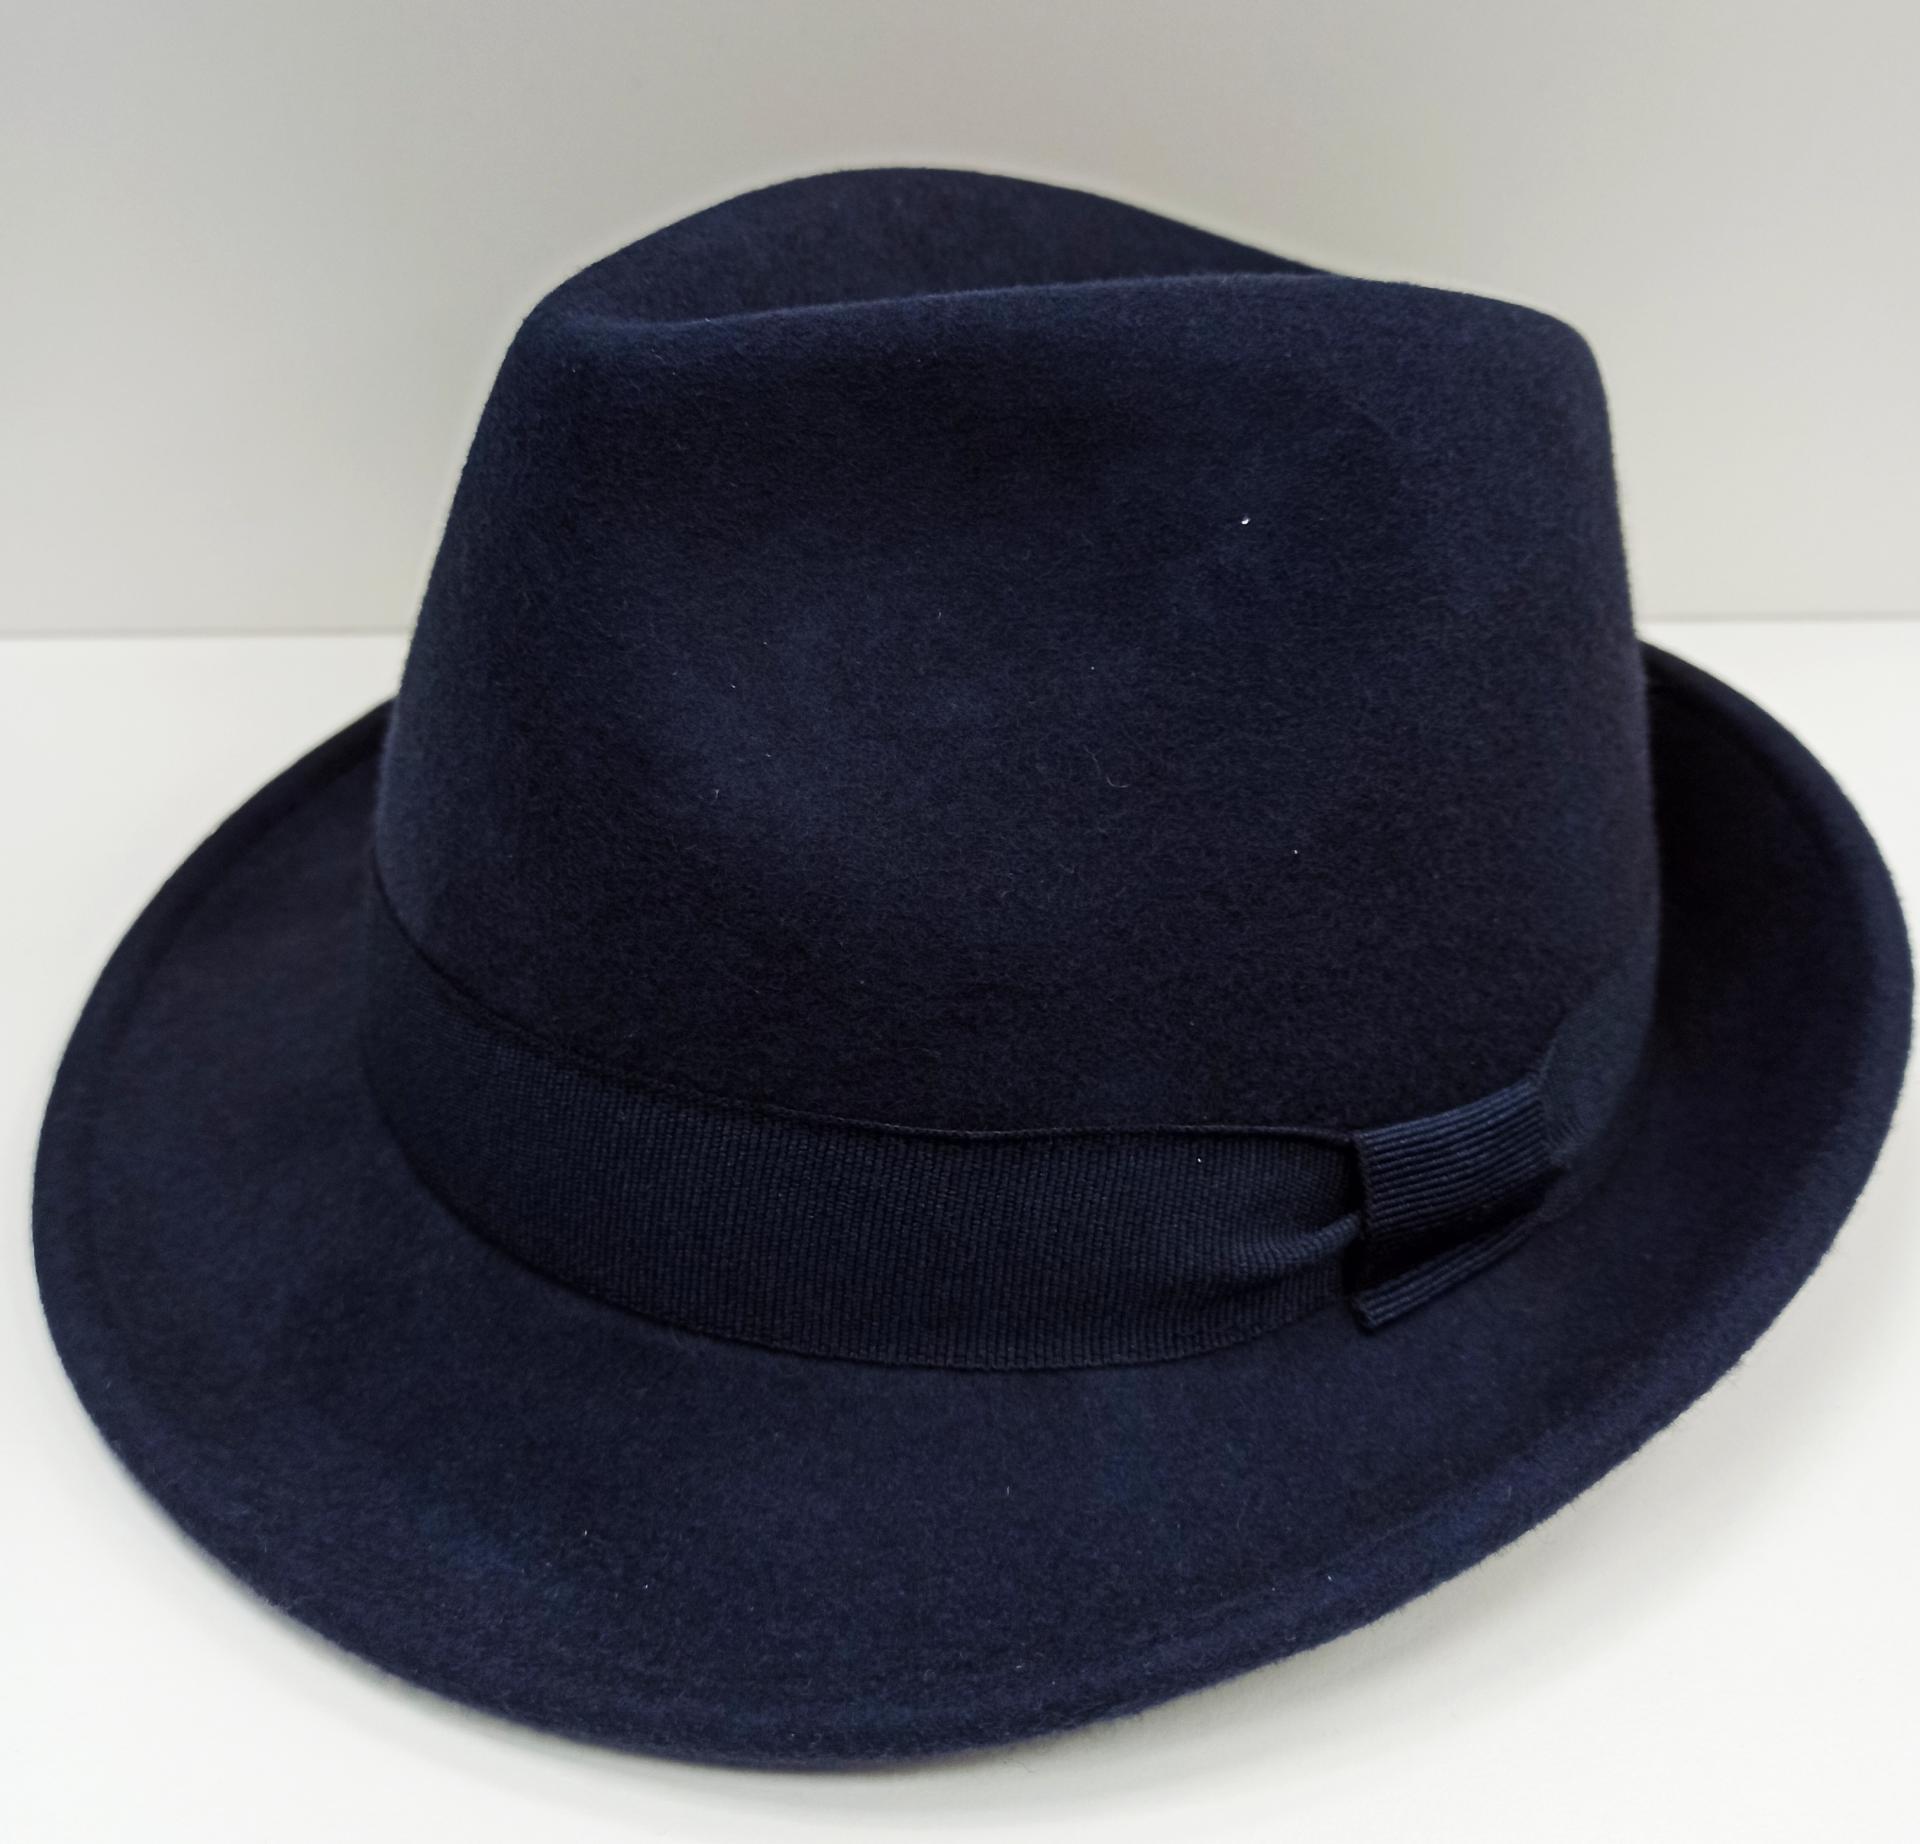 Sombrero Trilby azul